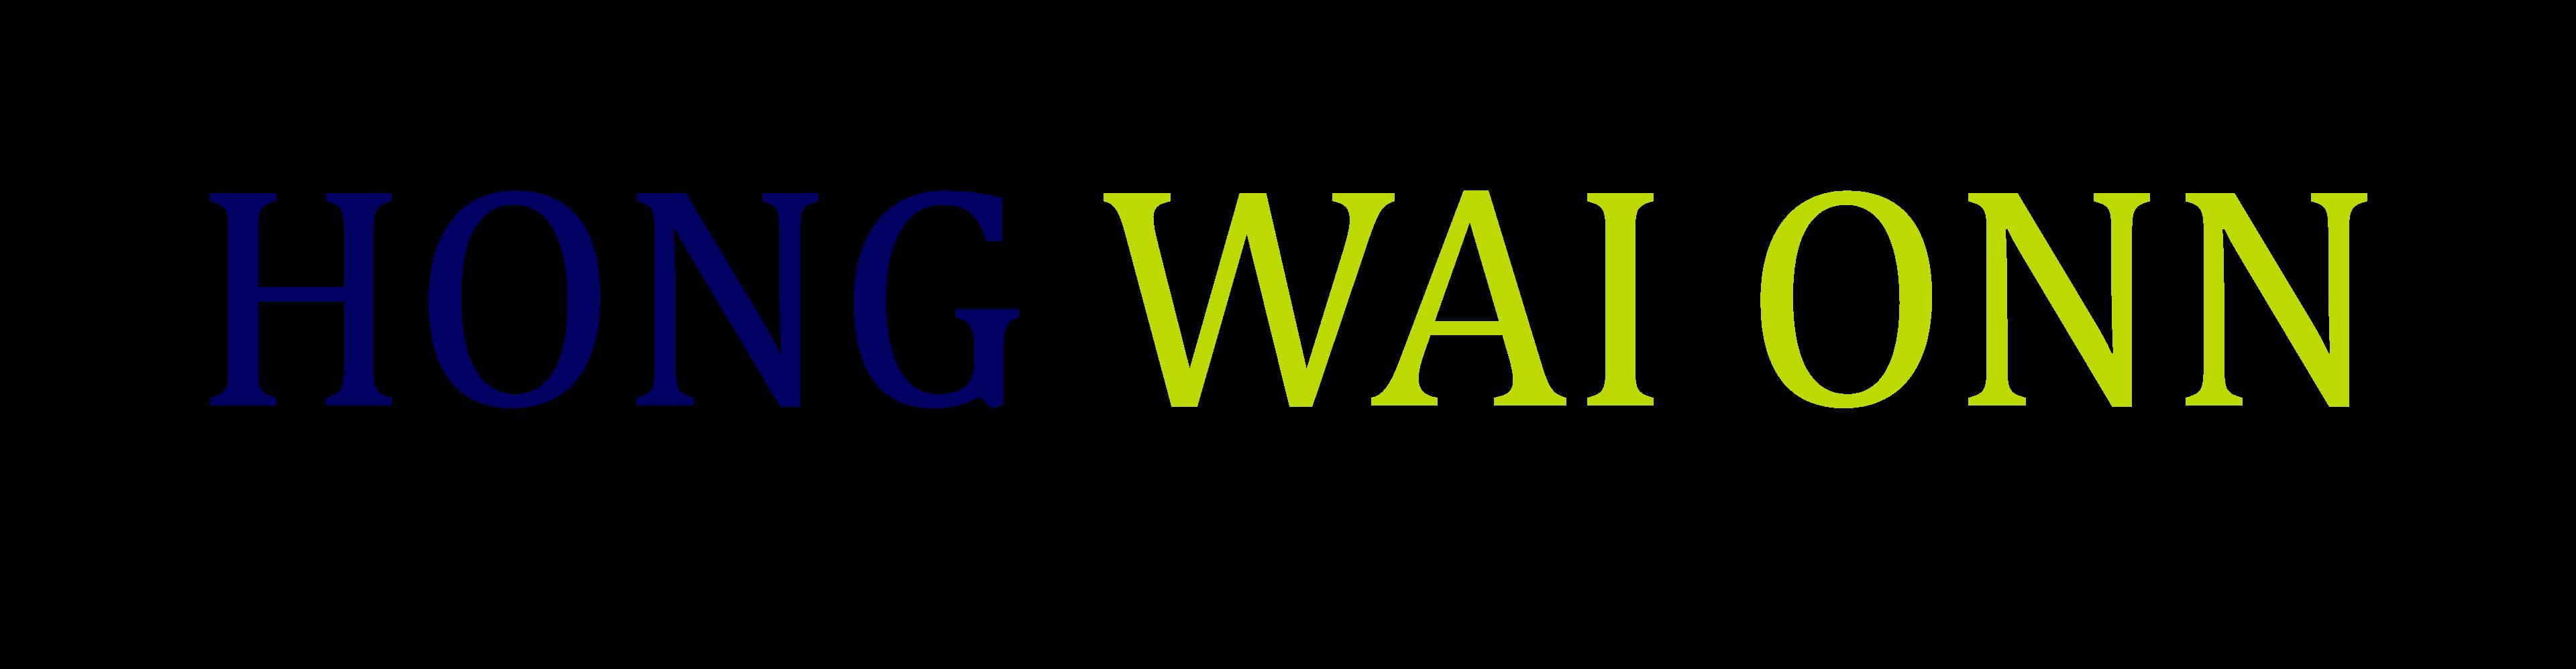 Hong Wai Onn | Chemical Engineer